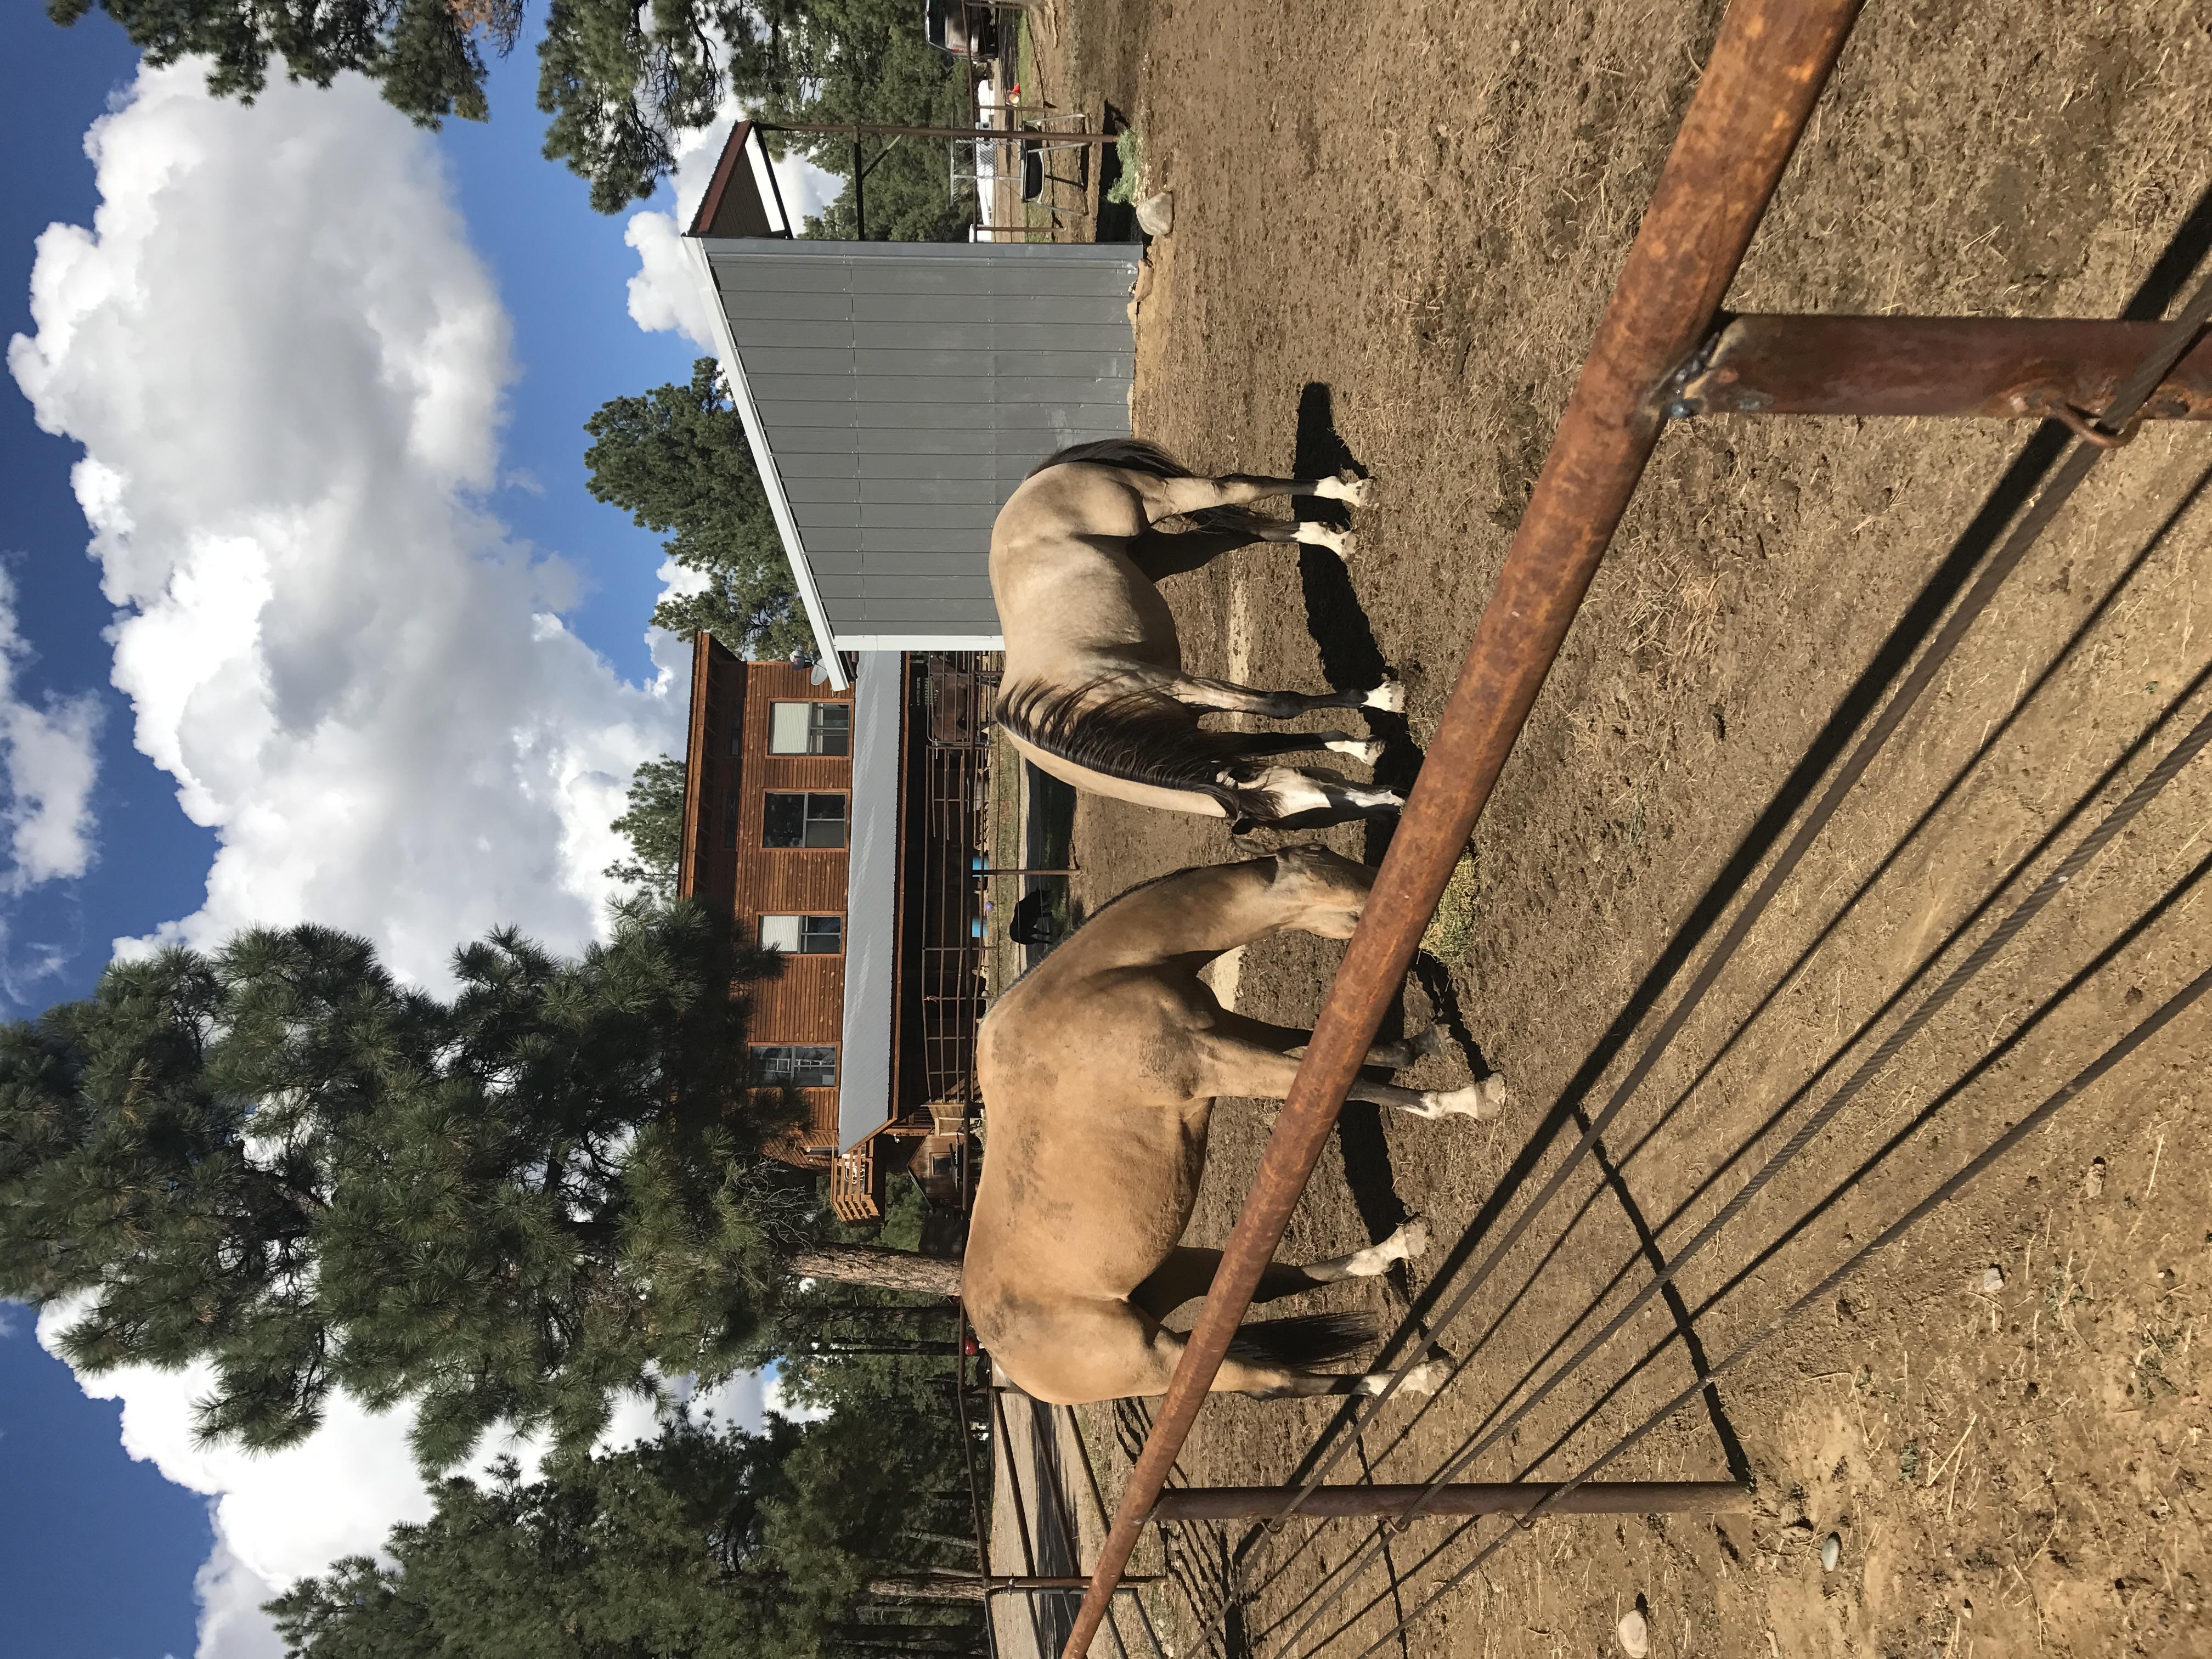 2 horses in paddock